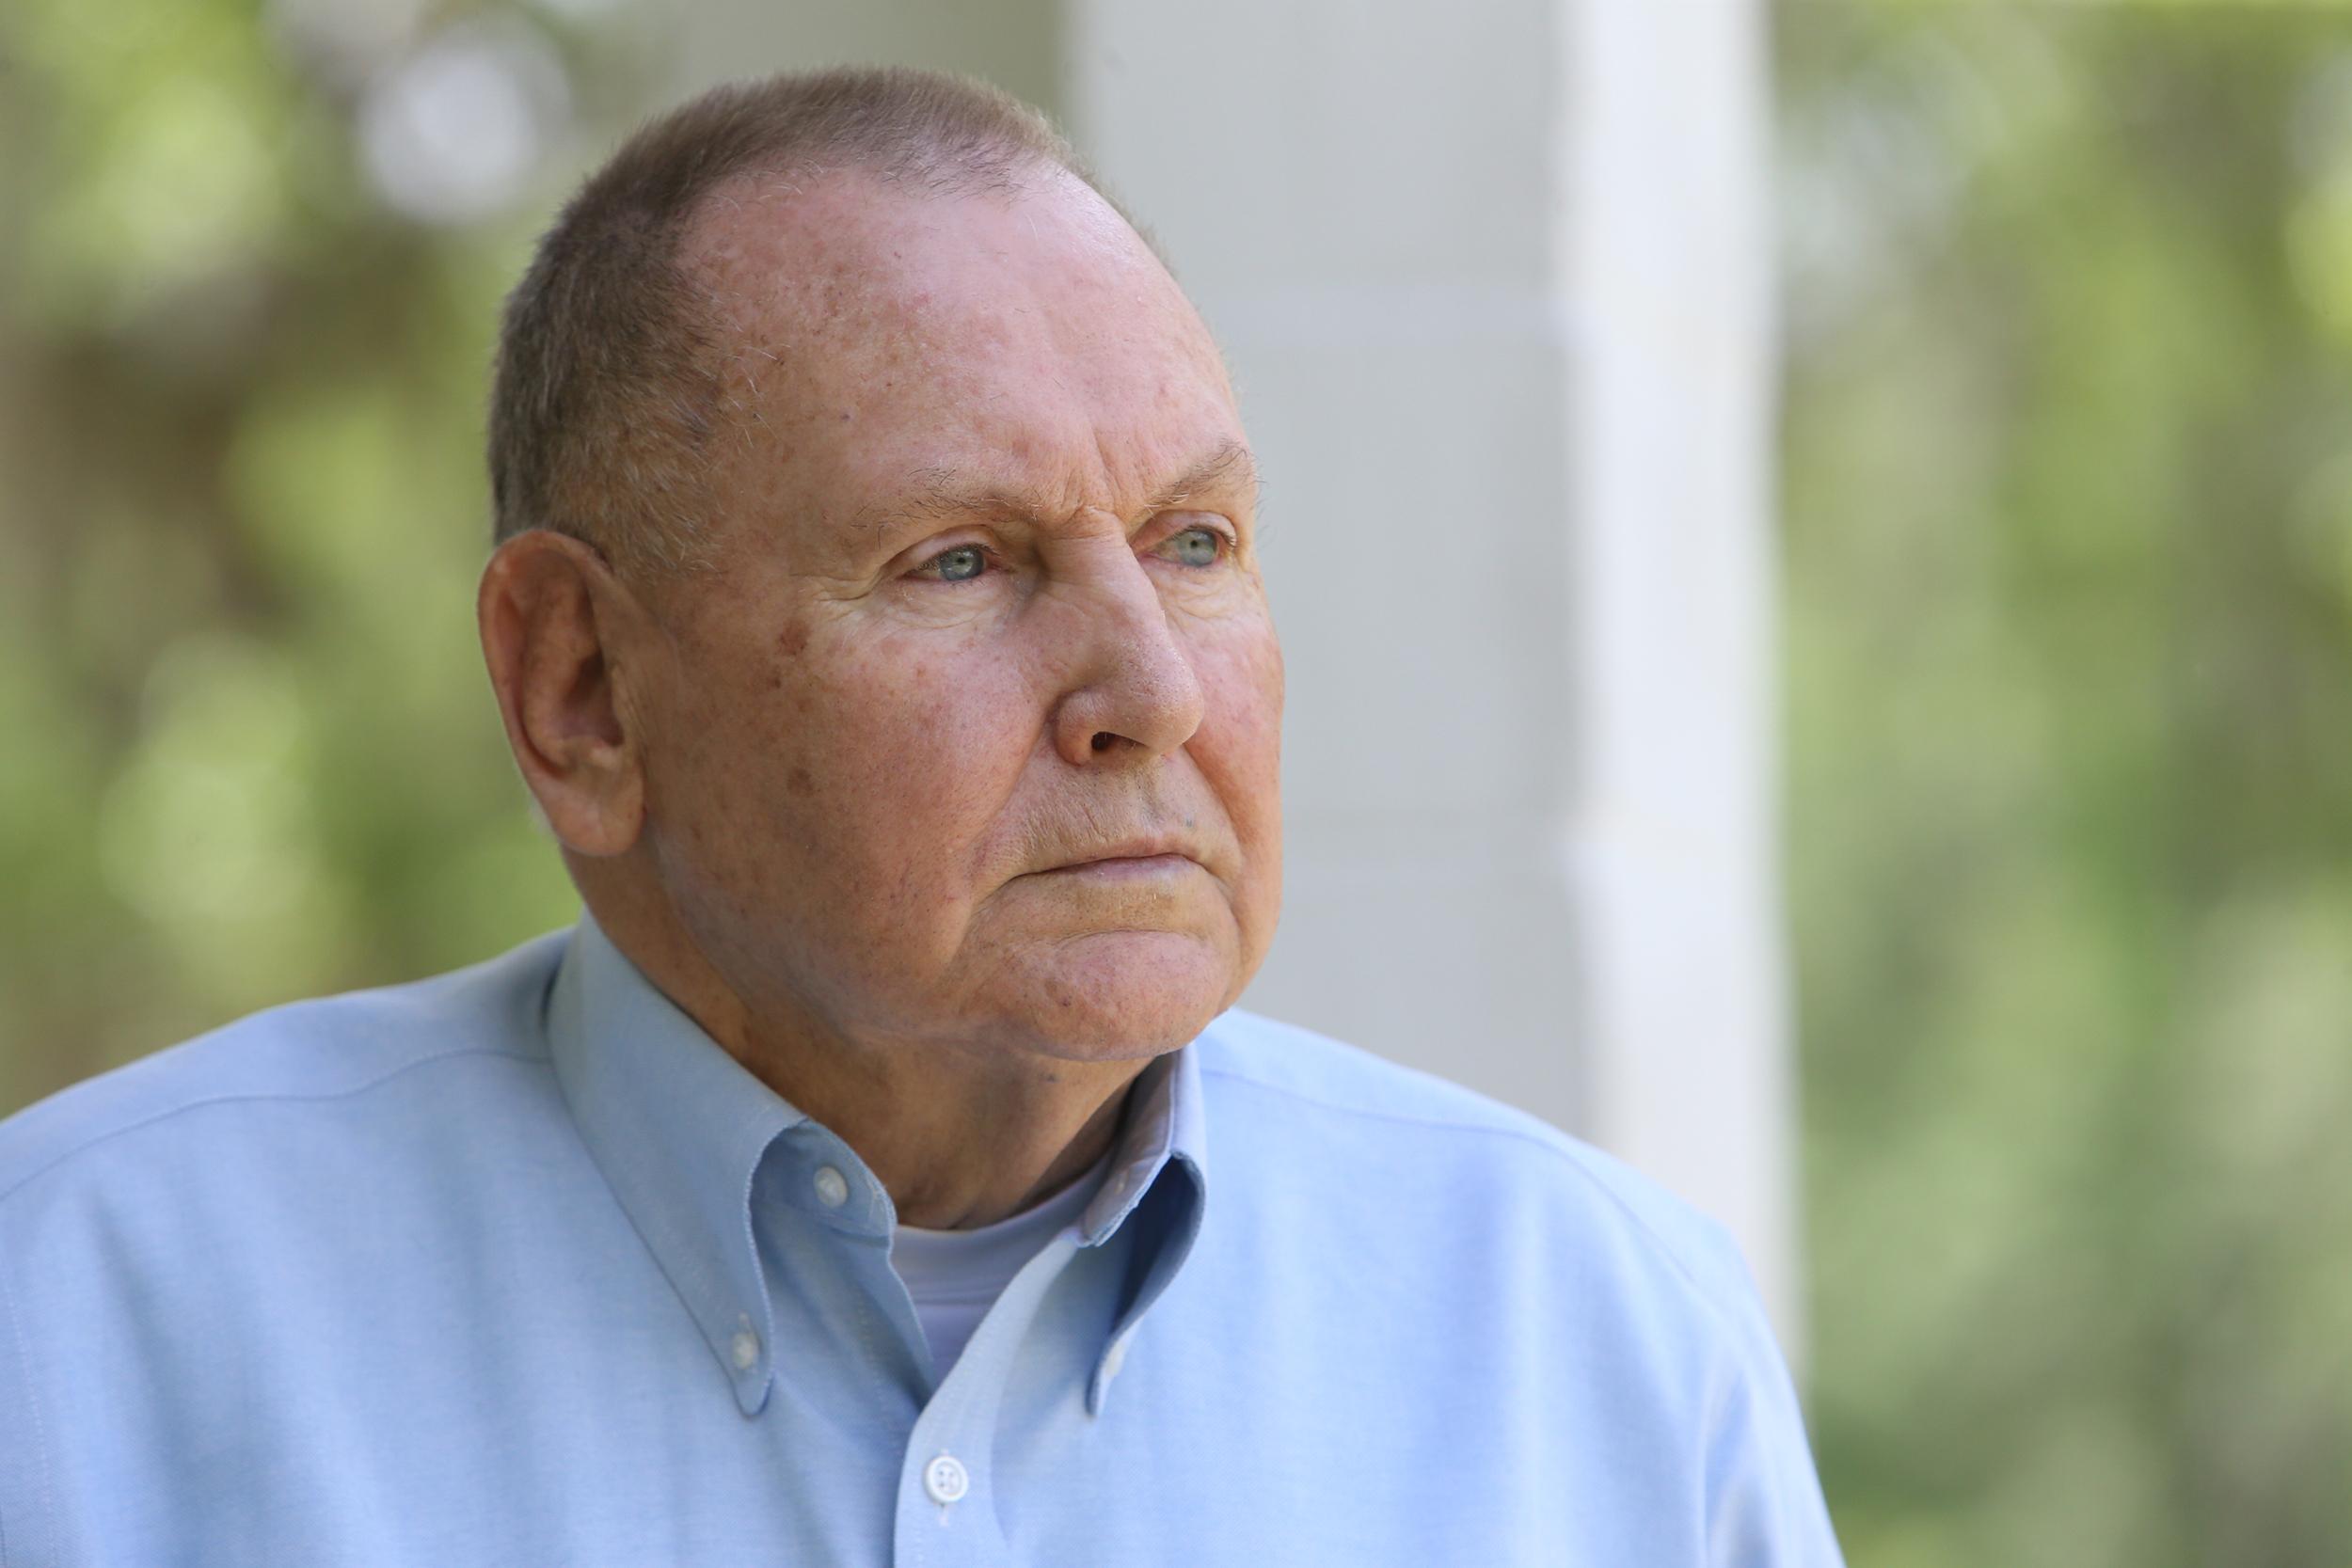 Butch Kennedy has spent years telling people he believes Dennis Perry is innocent.